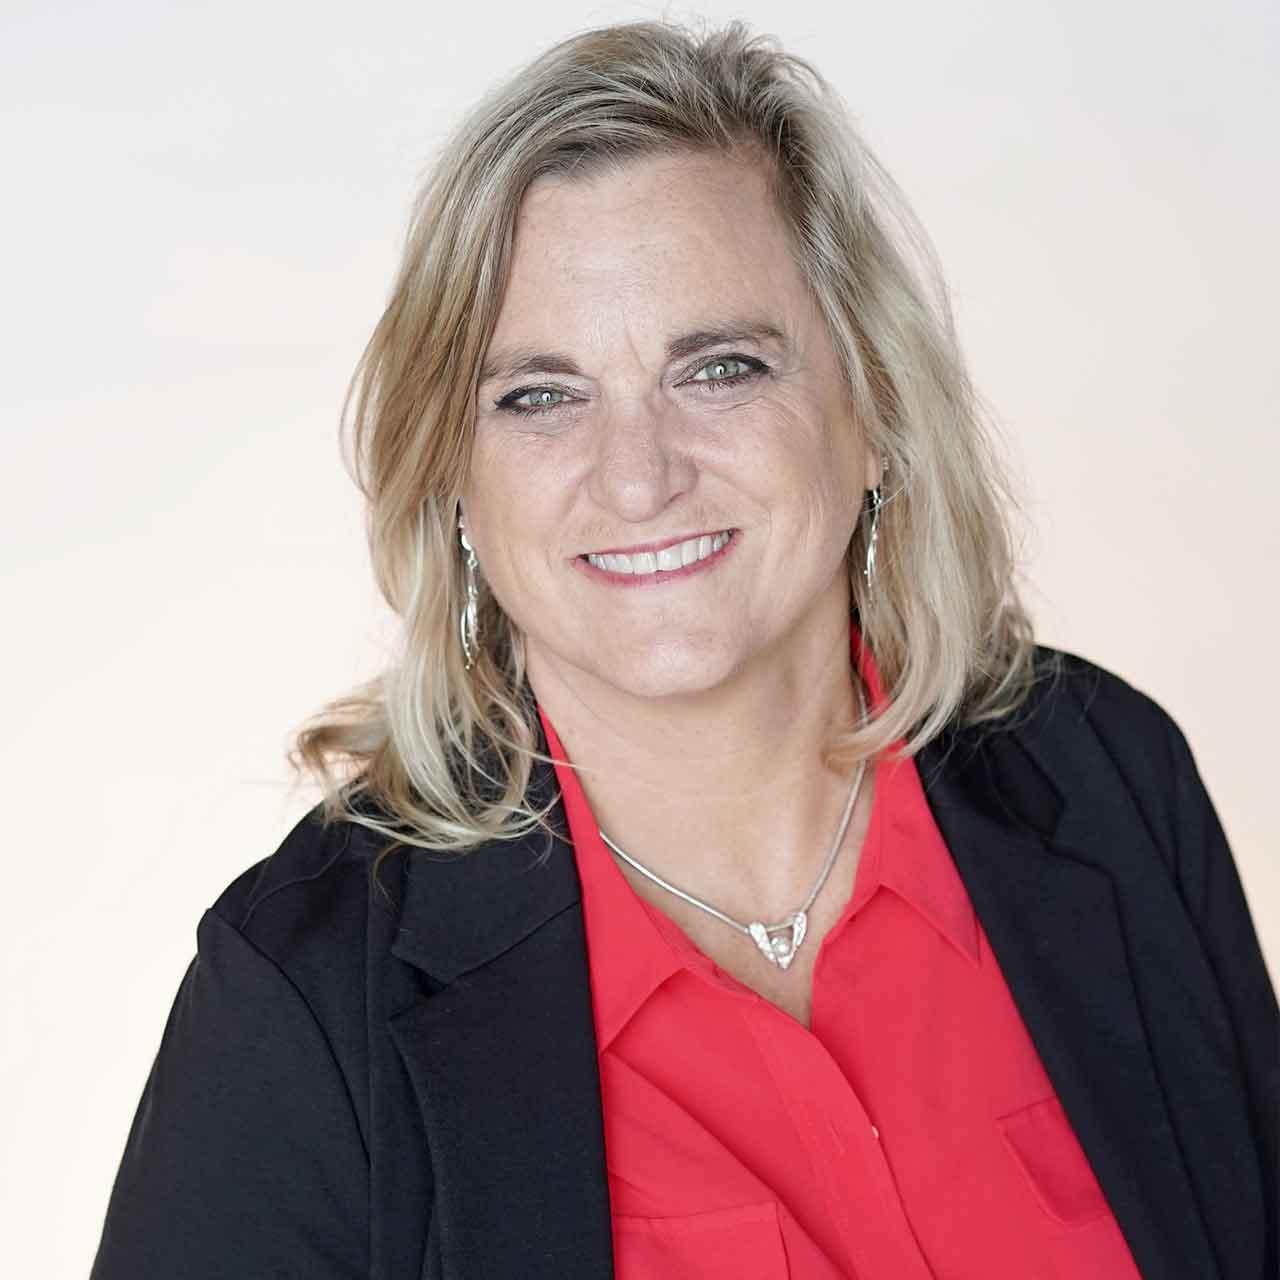 Julie Echard